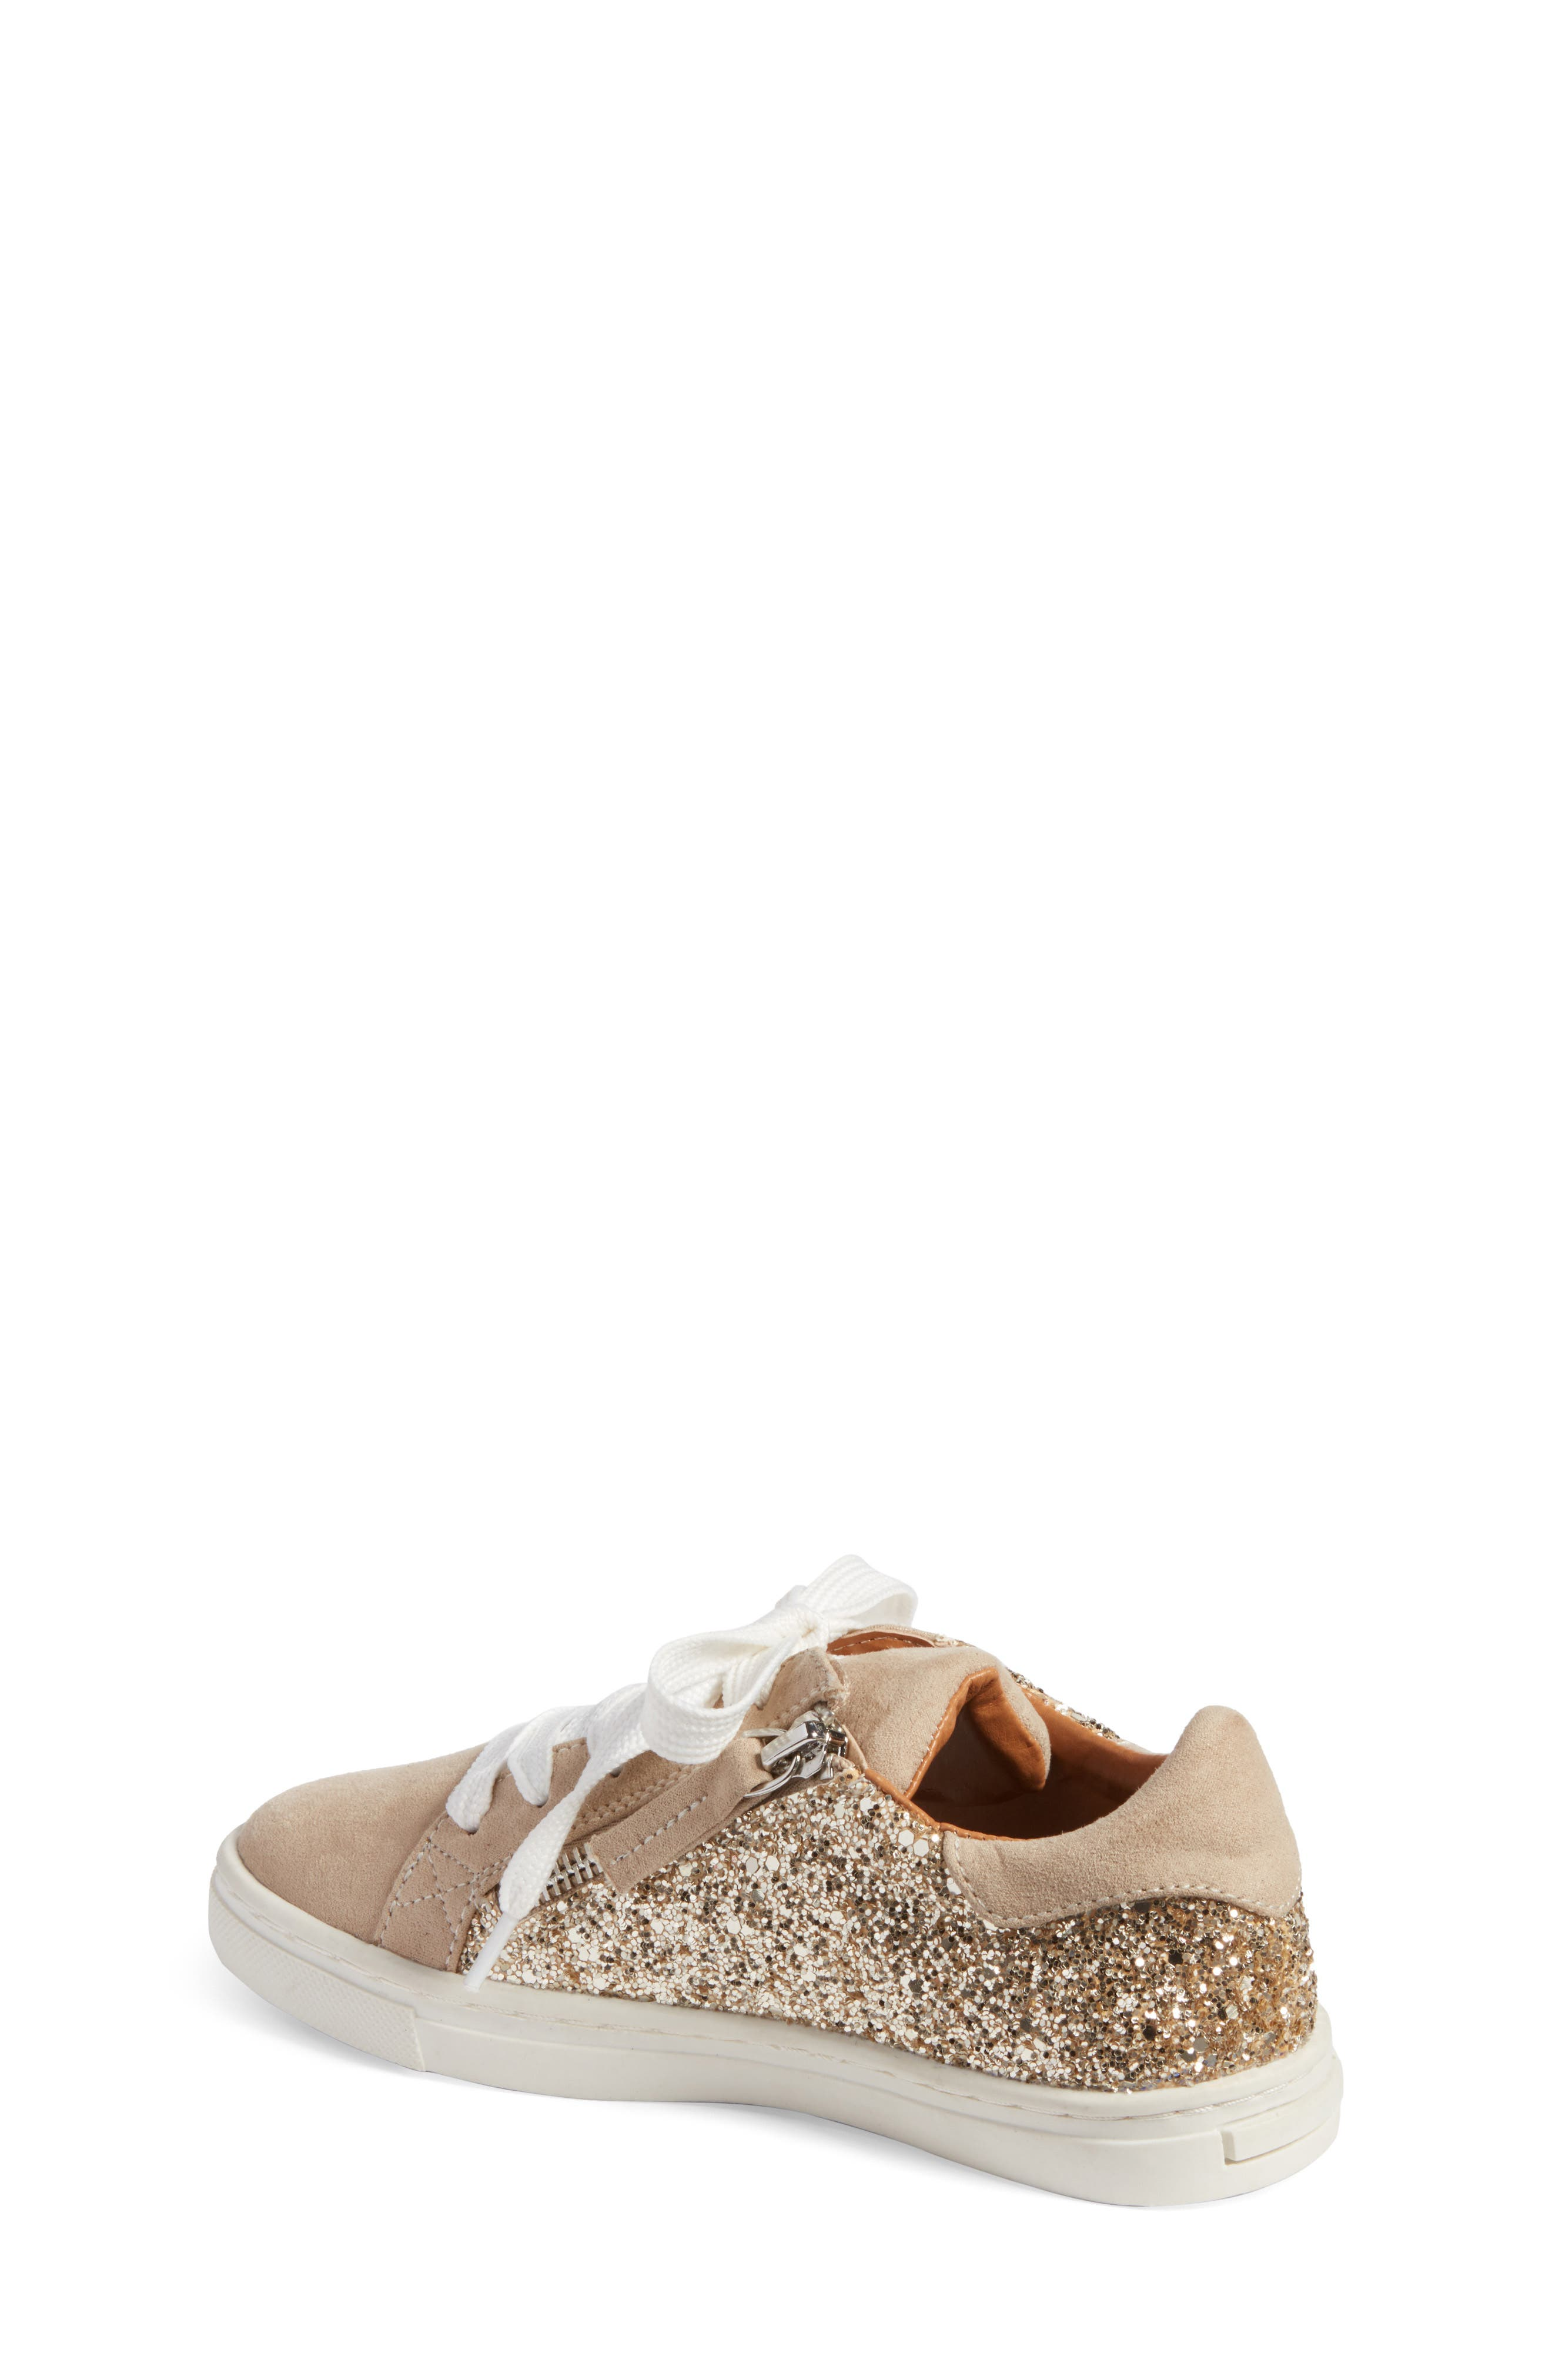 Zaida Low Top Sneaker,                             Alternate thumbnail 2, color,                             Gold Glitter